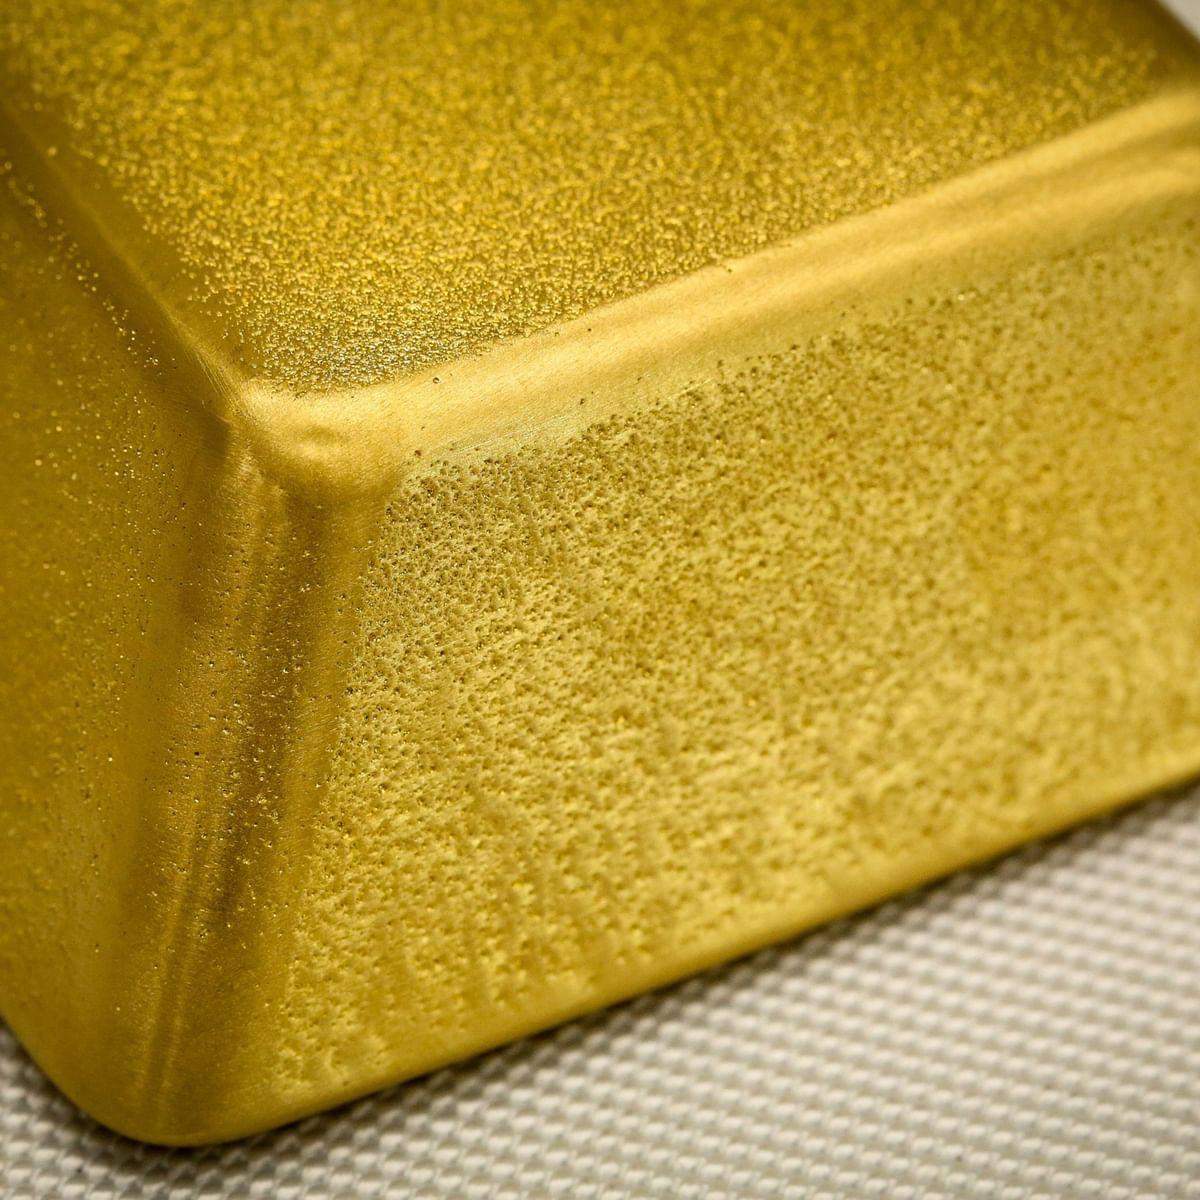 Should Investors Keep Adding Gold To Their Portfolio?